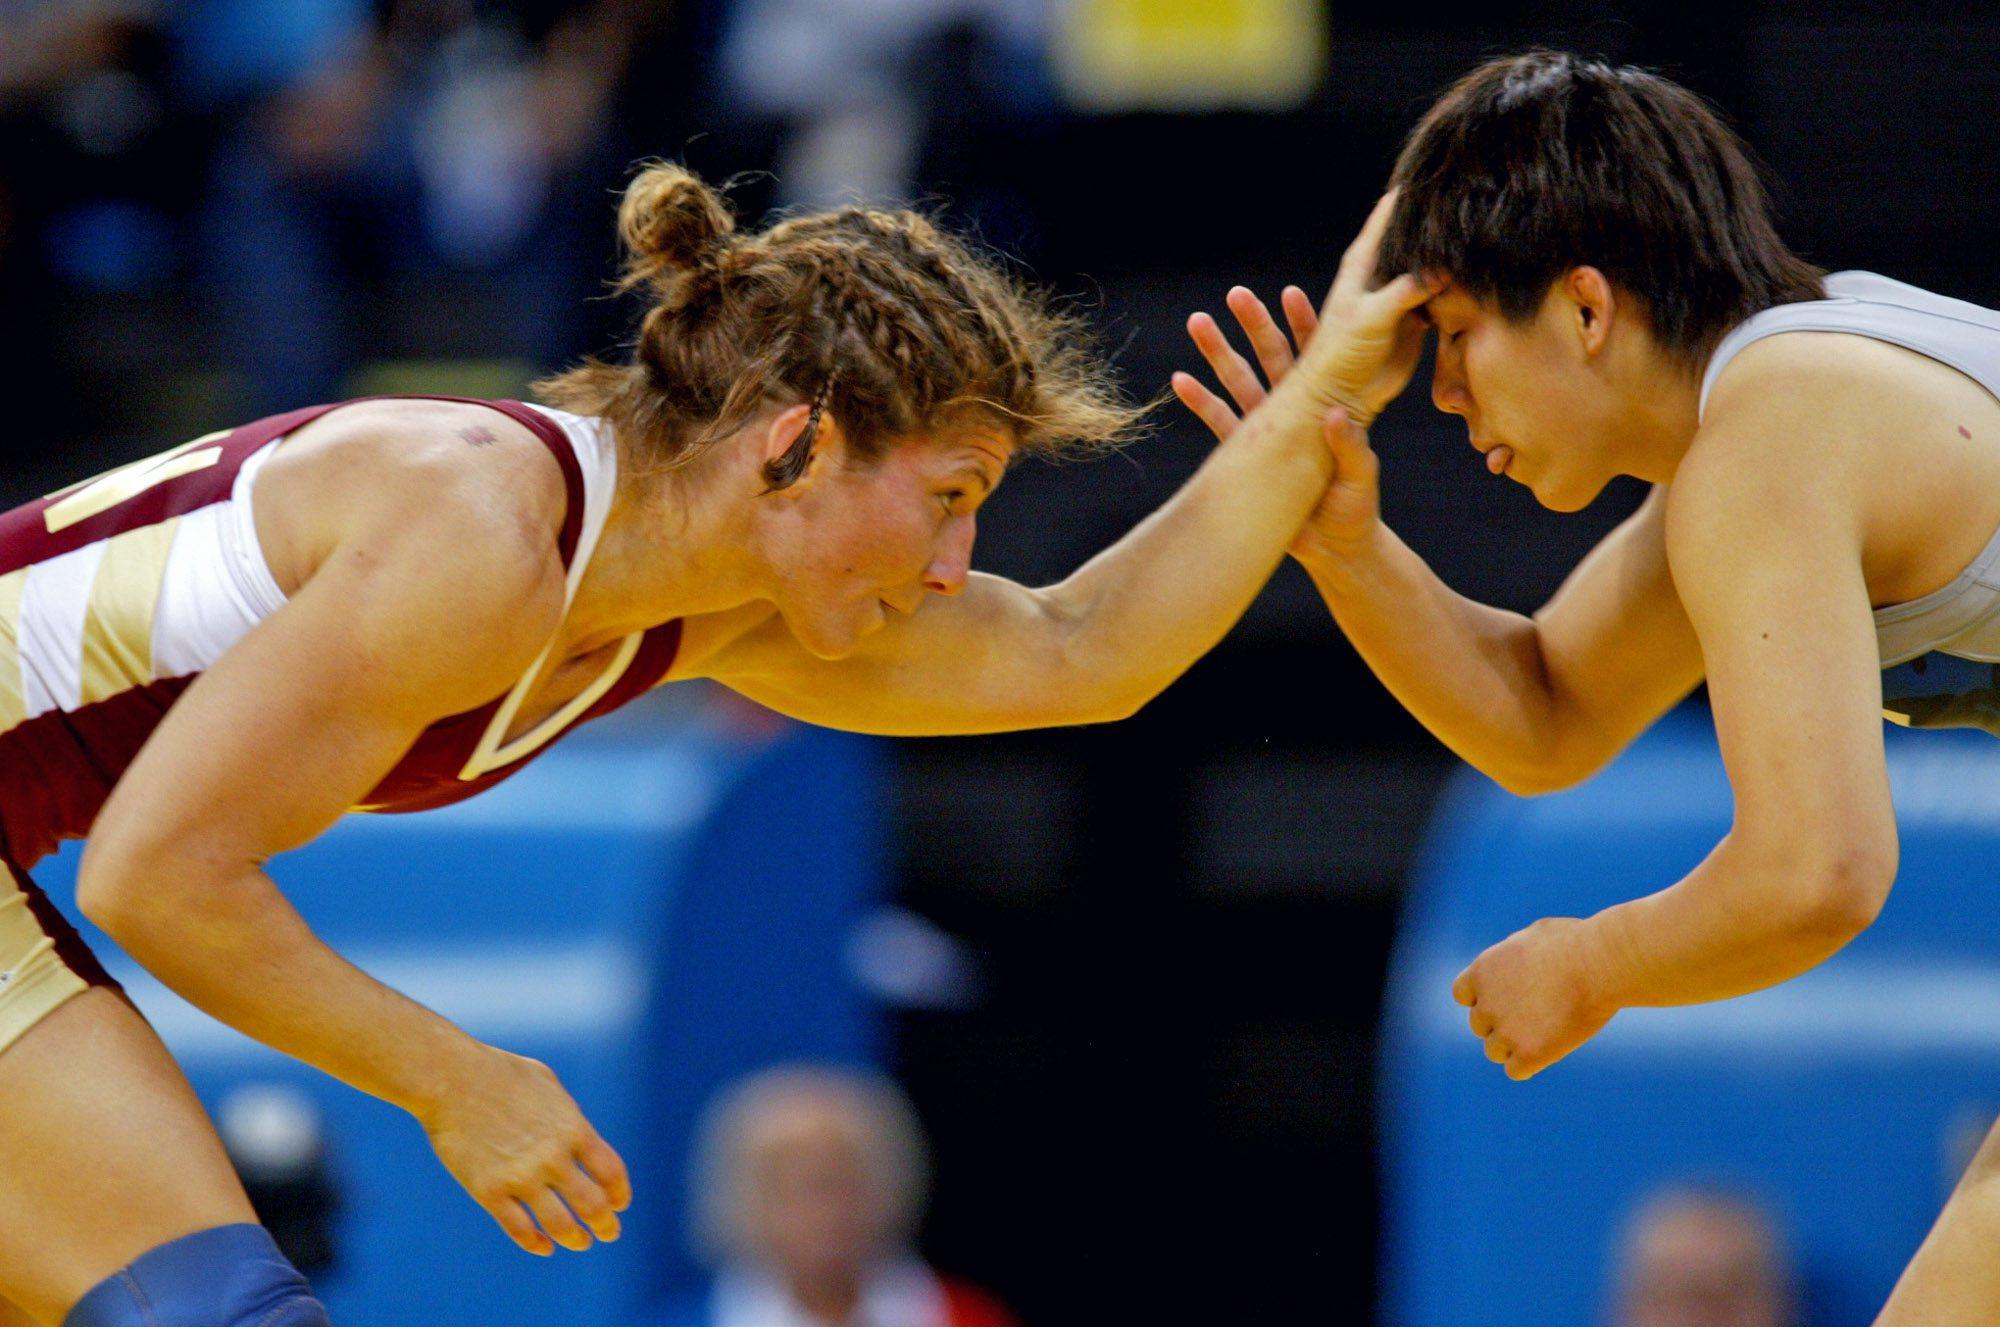 Female players wrestling